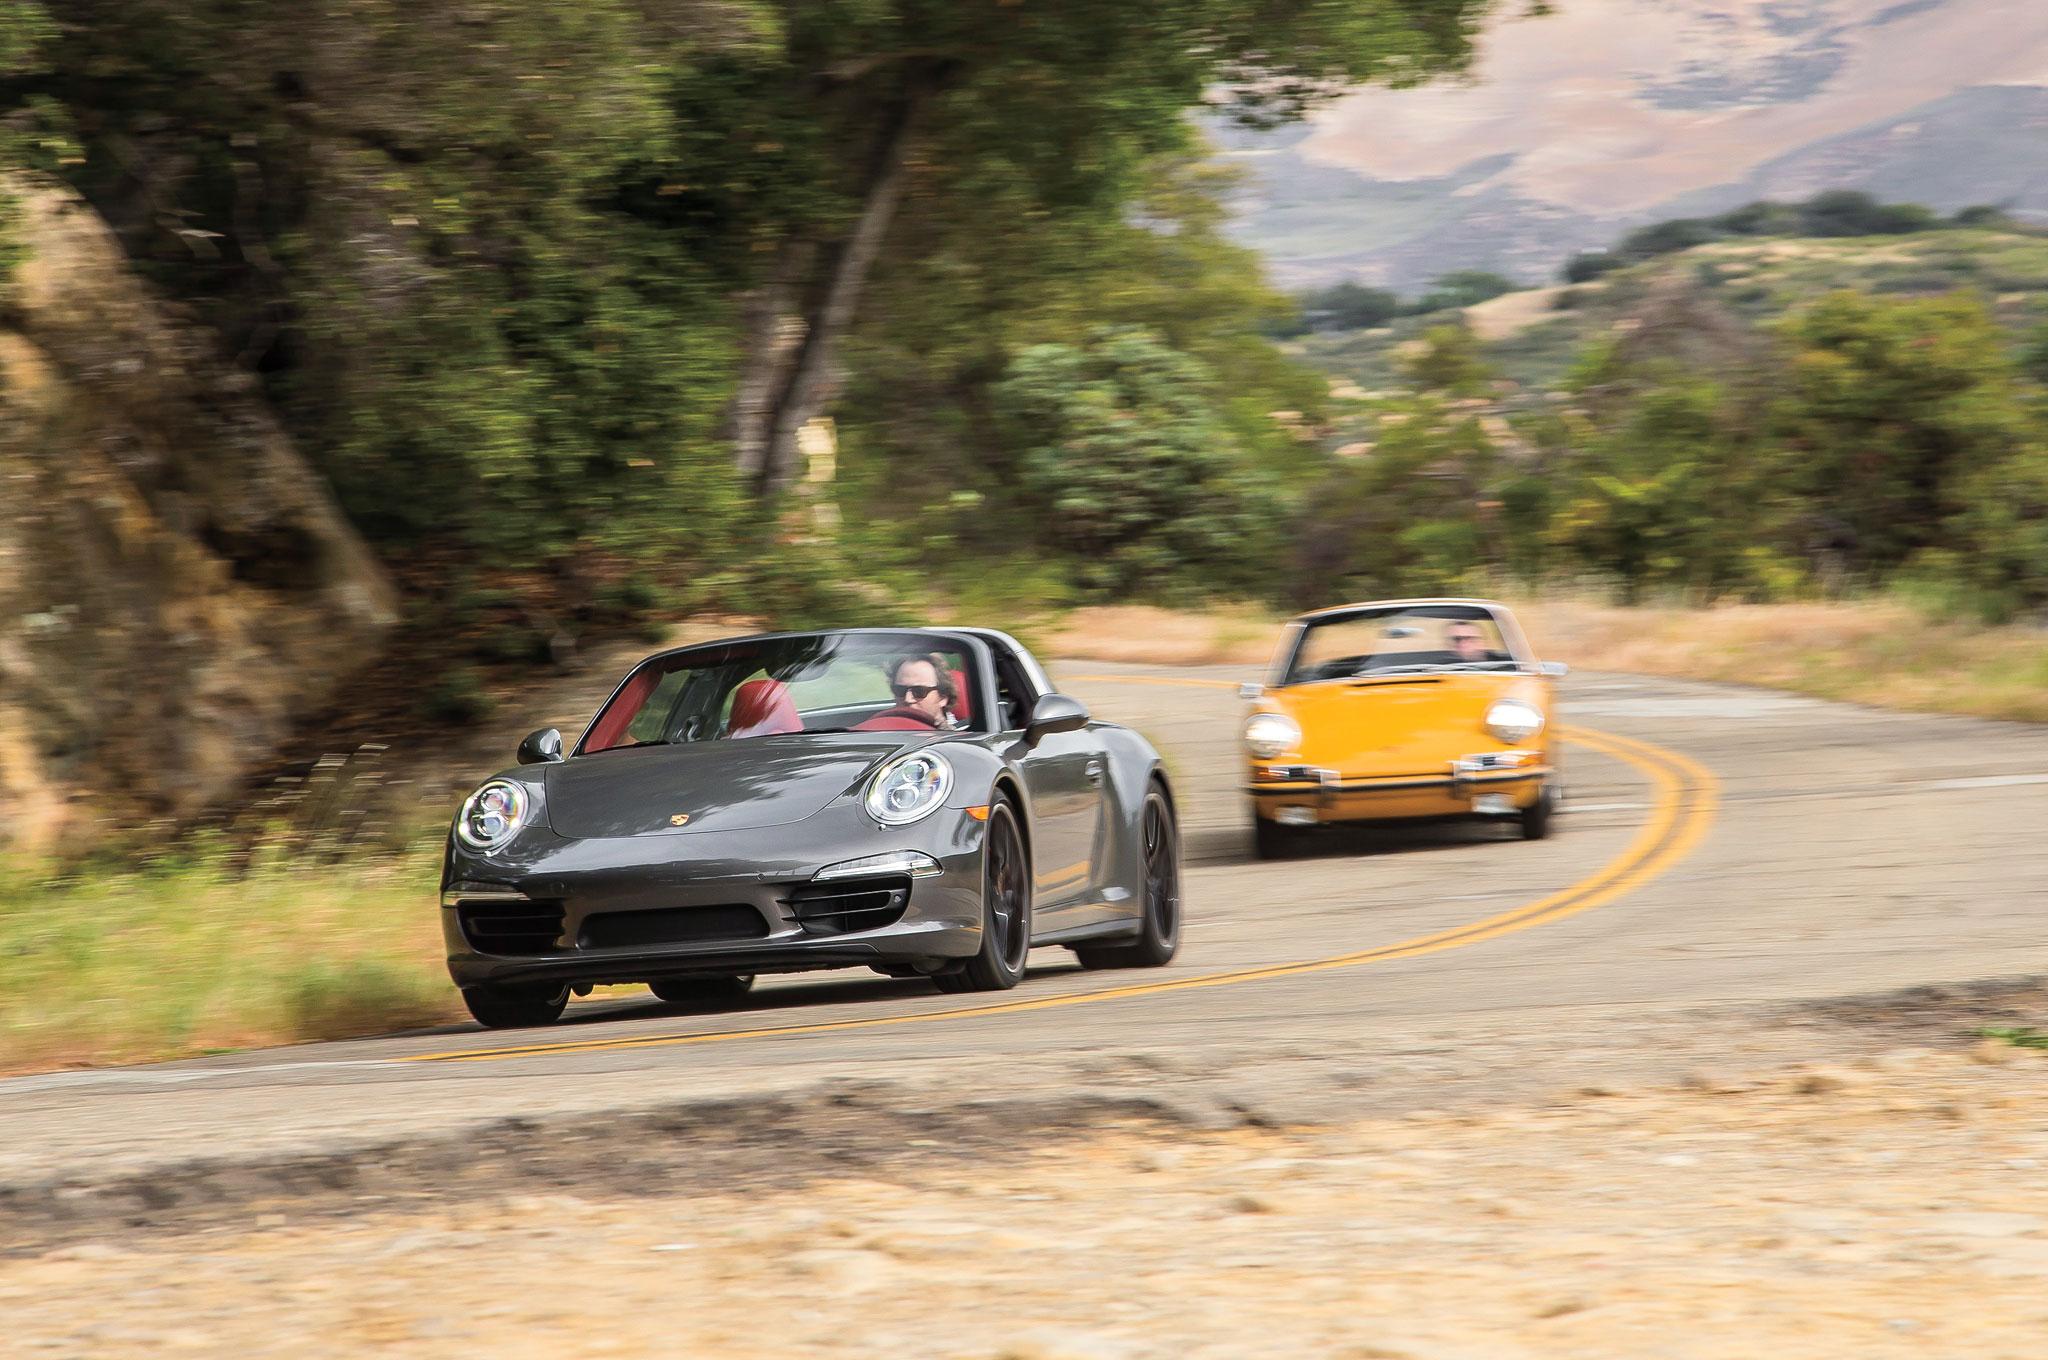 2016 Porsche 911 Targa 4S Front Three Quarter In Motion